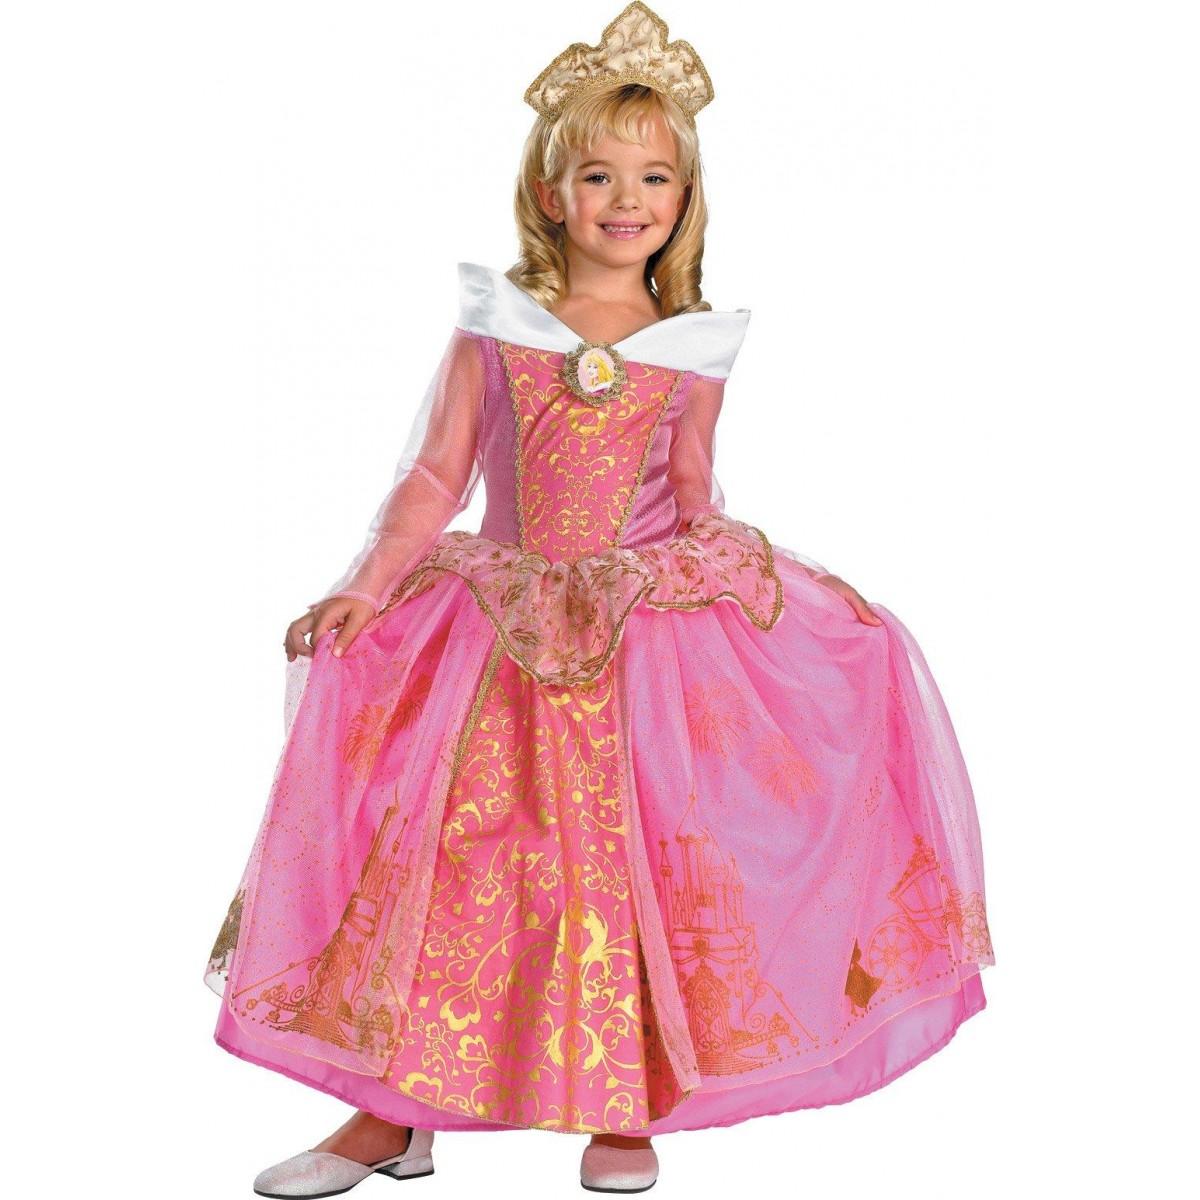 784ca3b6e75 Disney Storybook Aurora Prestige Toddler/Child Costume